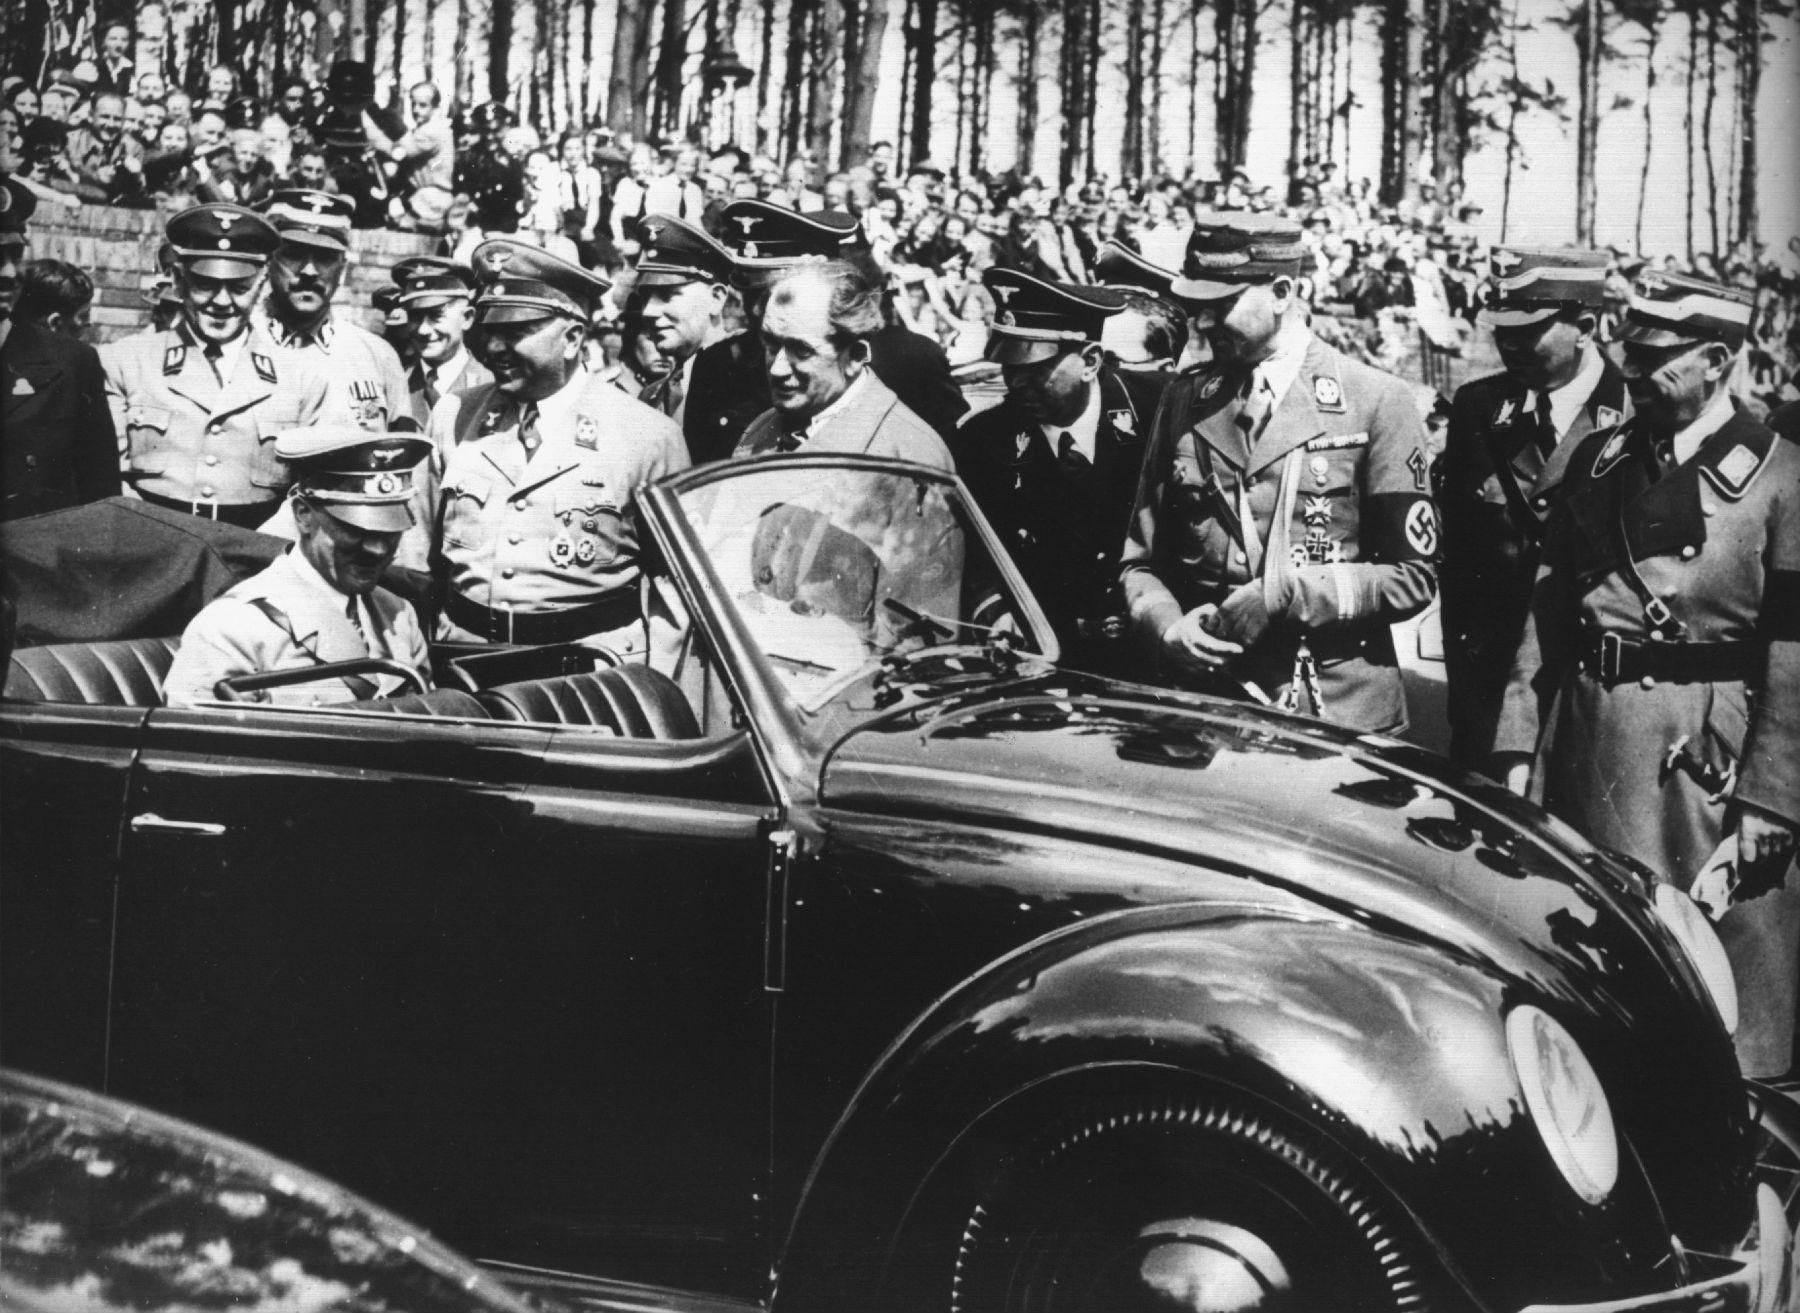 main-83904303-picture-alliance-dpa-vw-volkswagen-beetle-prototype-convertible-adolf-hitler-ferdinand-porsche-middle-no-hat-1936-stuttgart-nazis.jpg